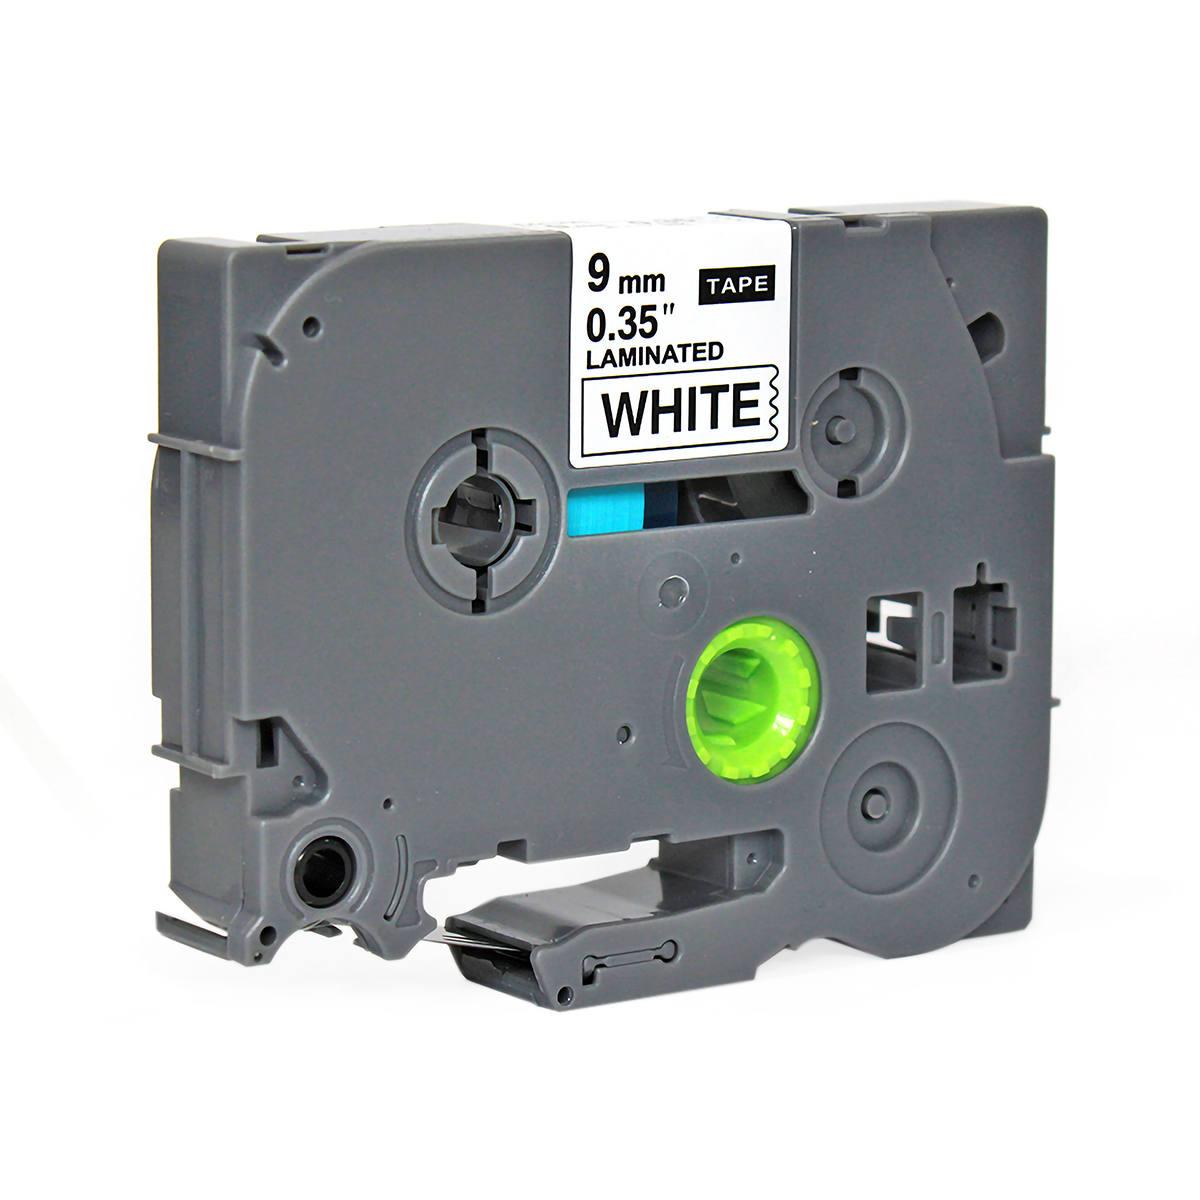 Fita Compatível para Rotulador 9mm x 8m Branco/Preto Marca X-Full Referência TZc-221 TZ-221 TZe-221 para Brother